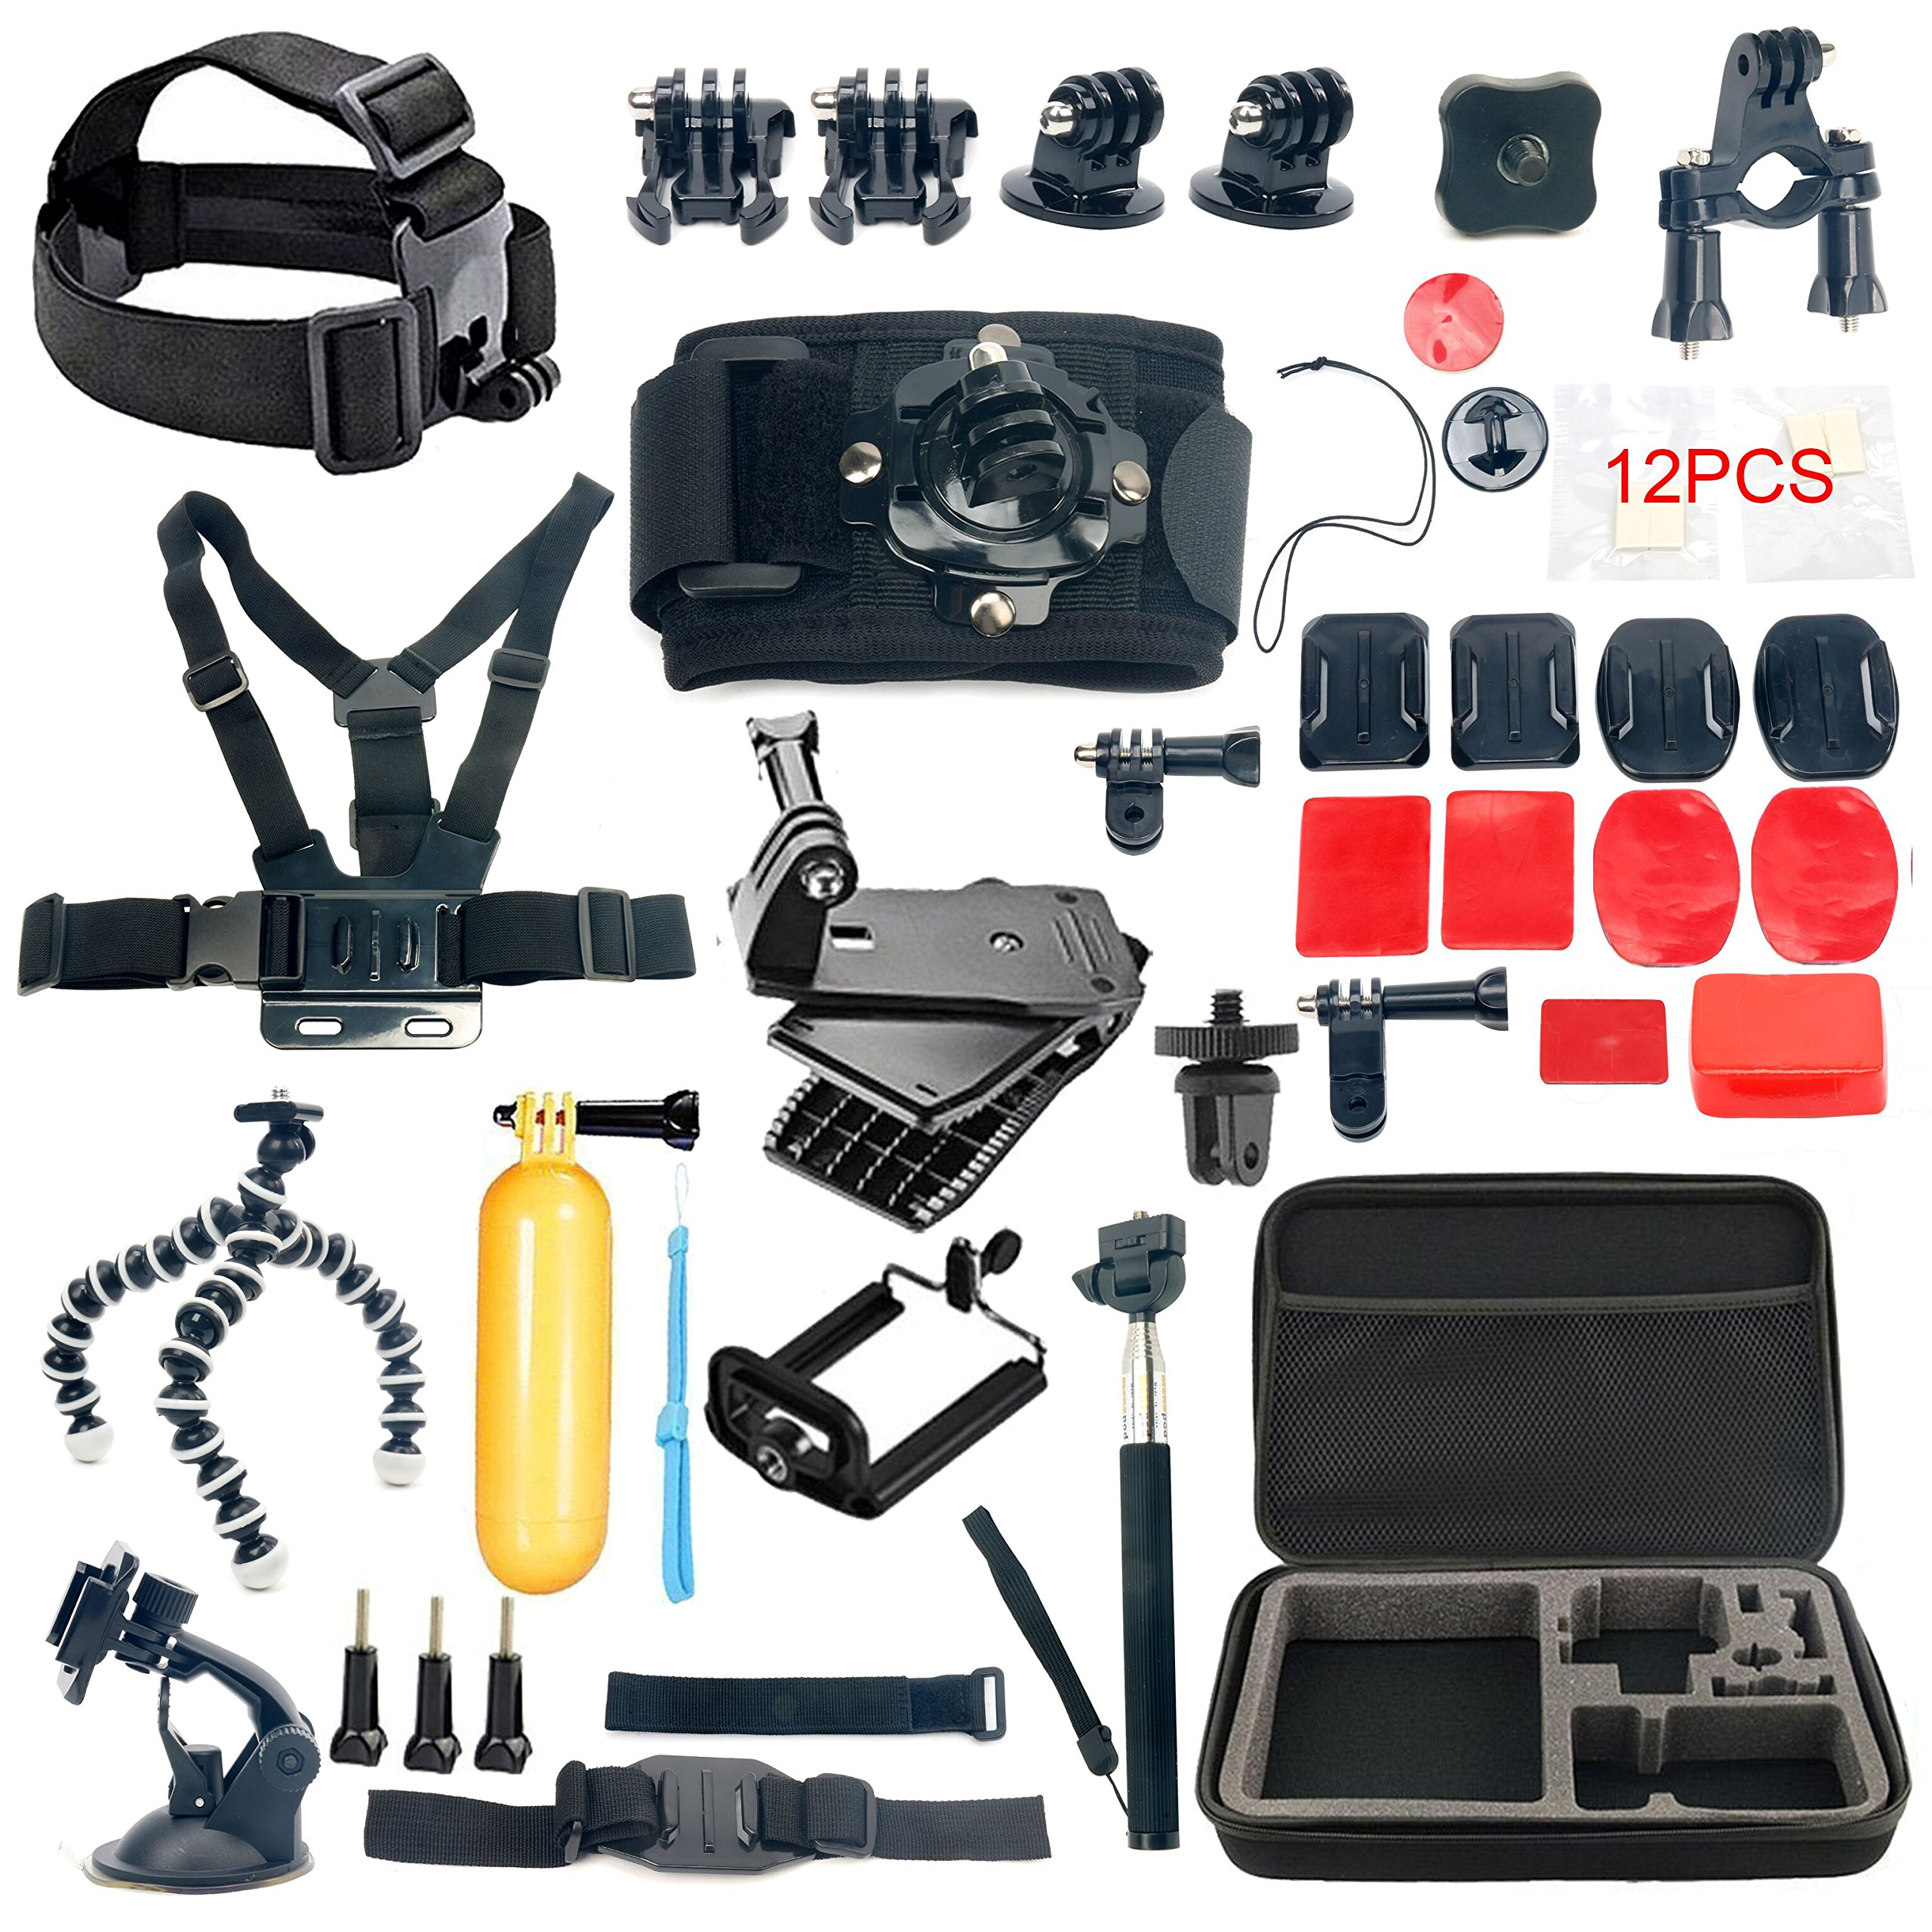 YaeCCC 42-in-1 Gopro Accessory Kit for GoPro Hero5 Black, Hero5 Session, Hero 4 Silver Black, Hero Session, Accessory Bundle Set for GoPro Hero3+ 3 2 1, SJ Cam Xiaoyi